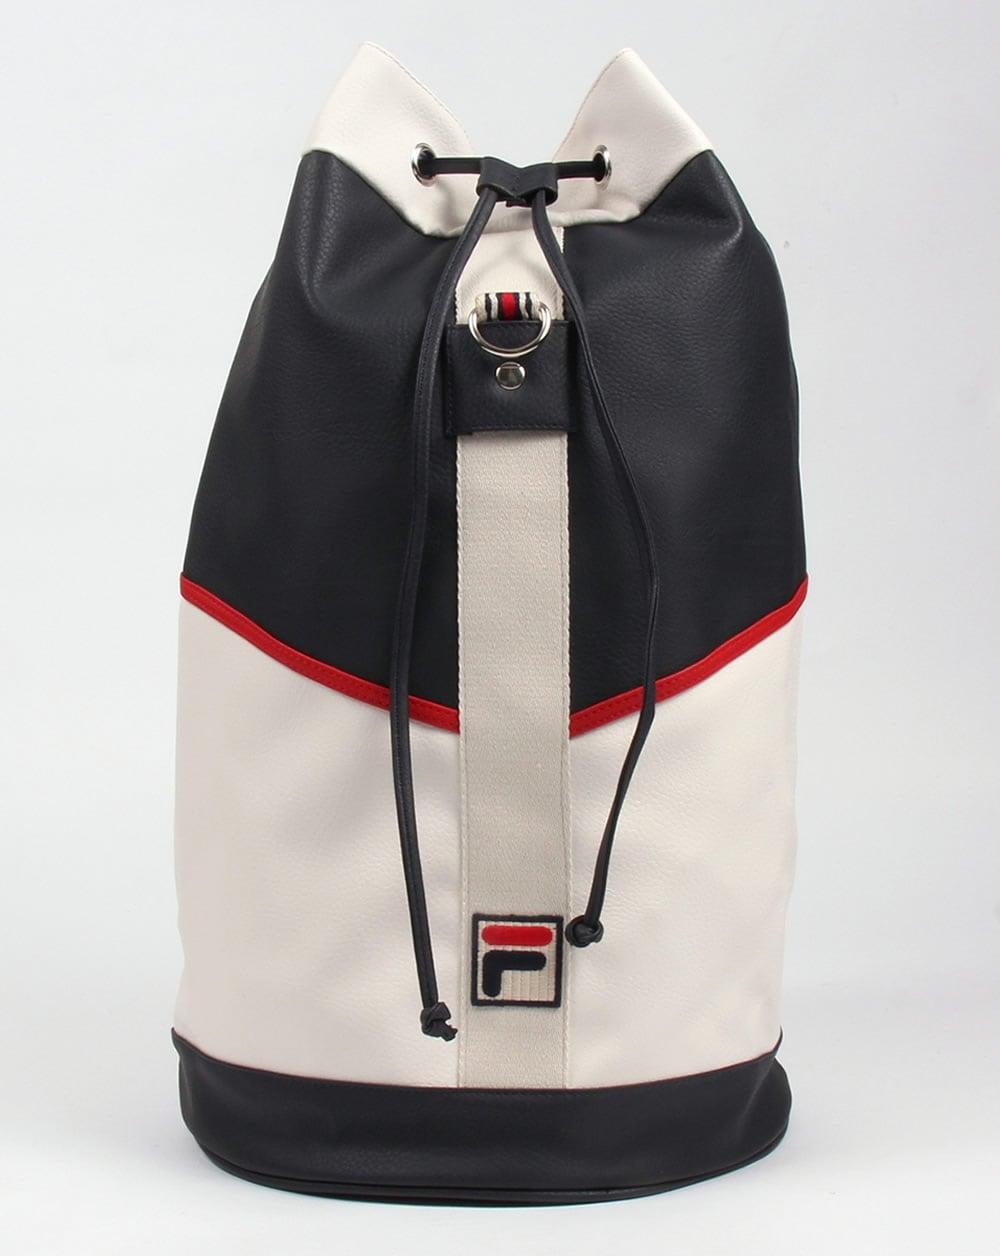 Fila Vintage Biago Duffle Bag Navy/White,holiday,holdall